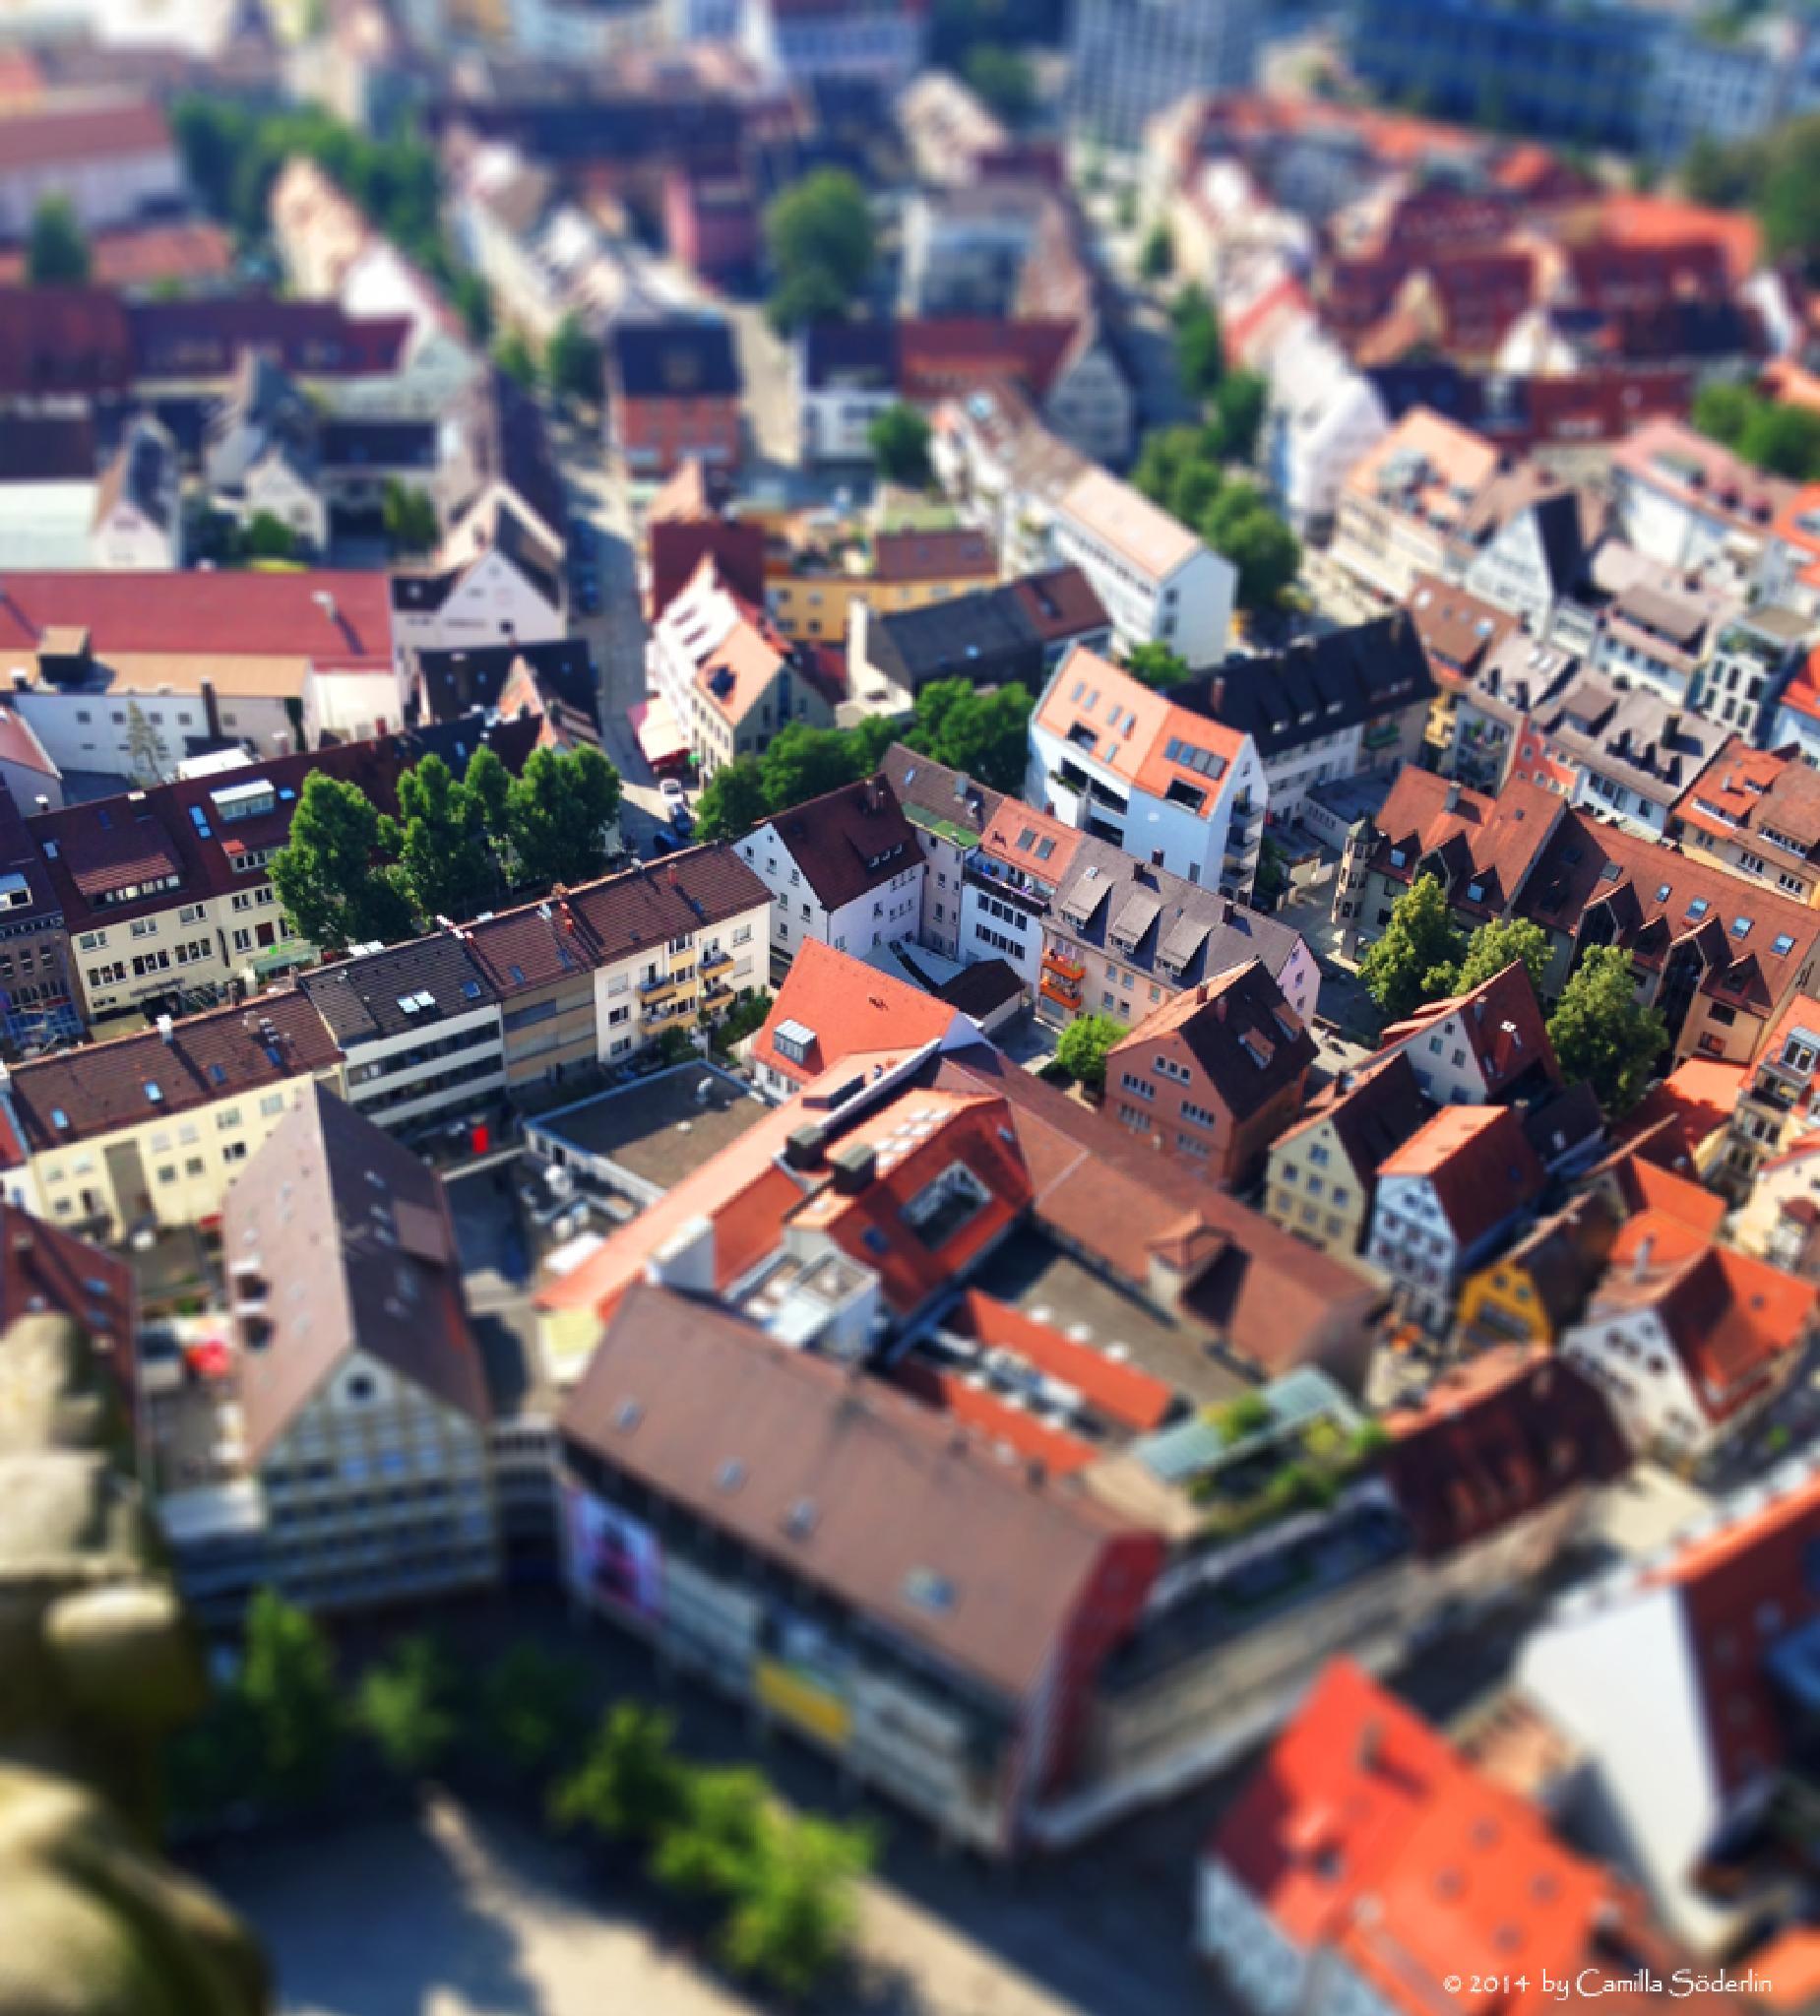 Ulm in miniature by Camilla Söderlin